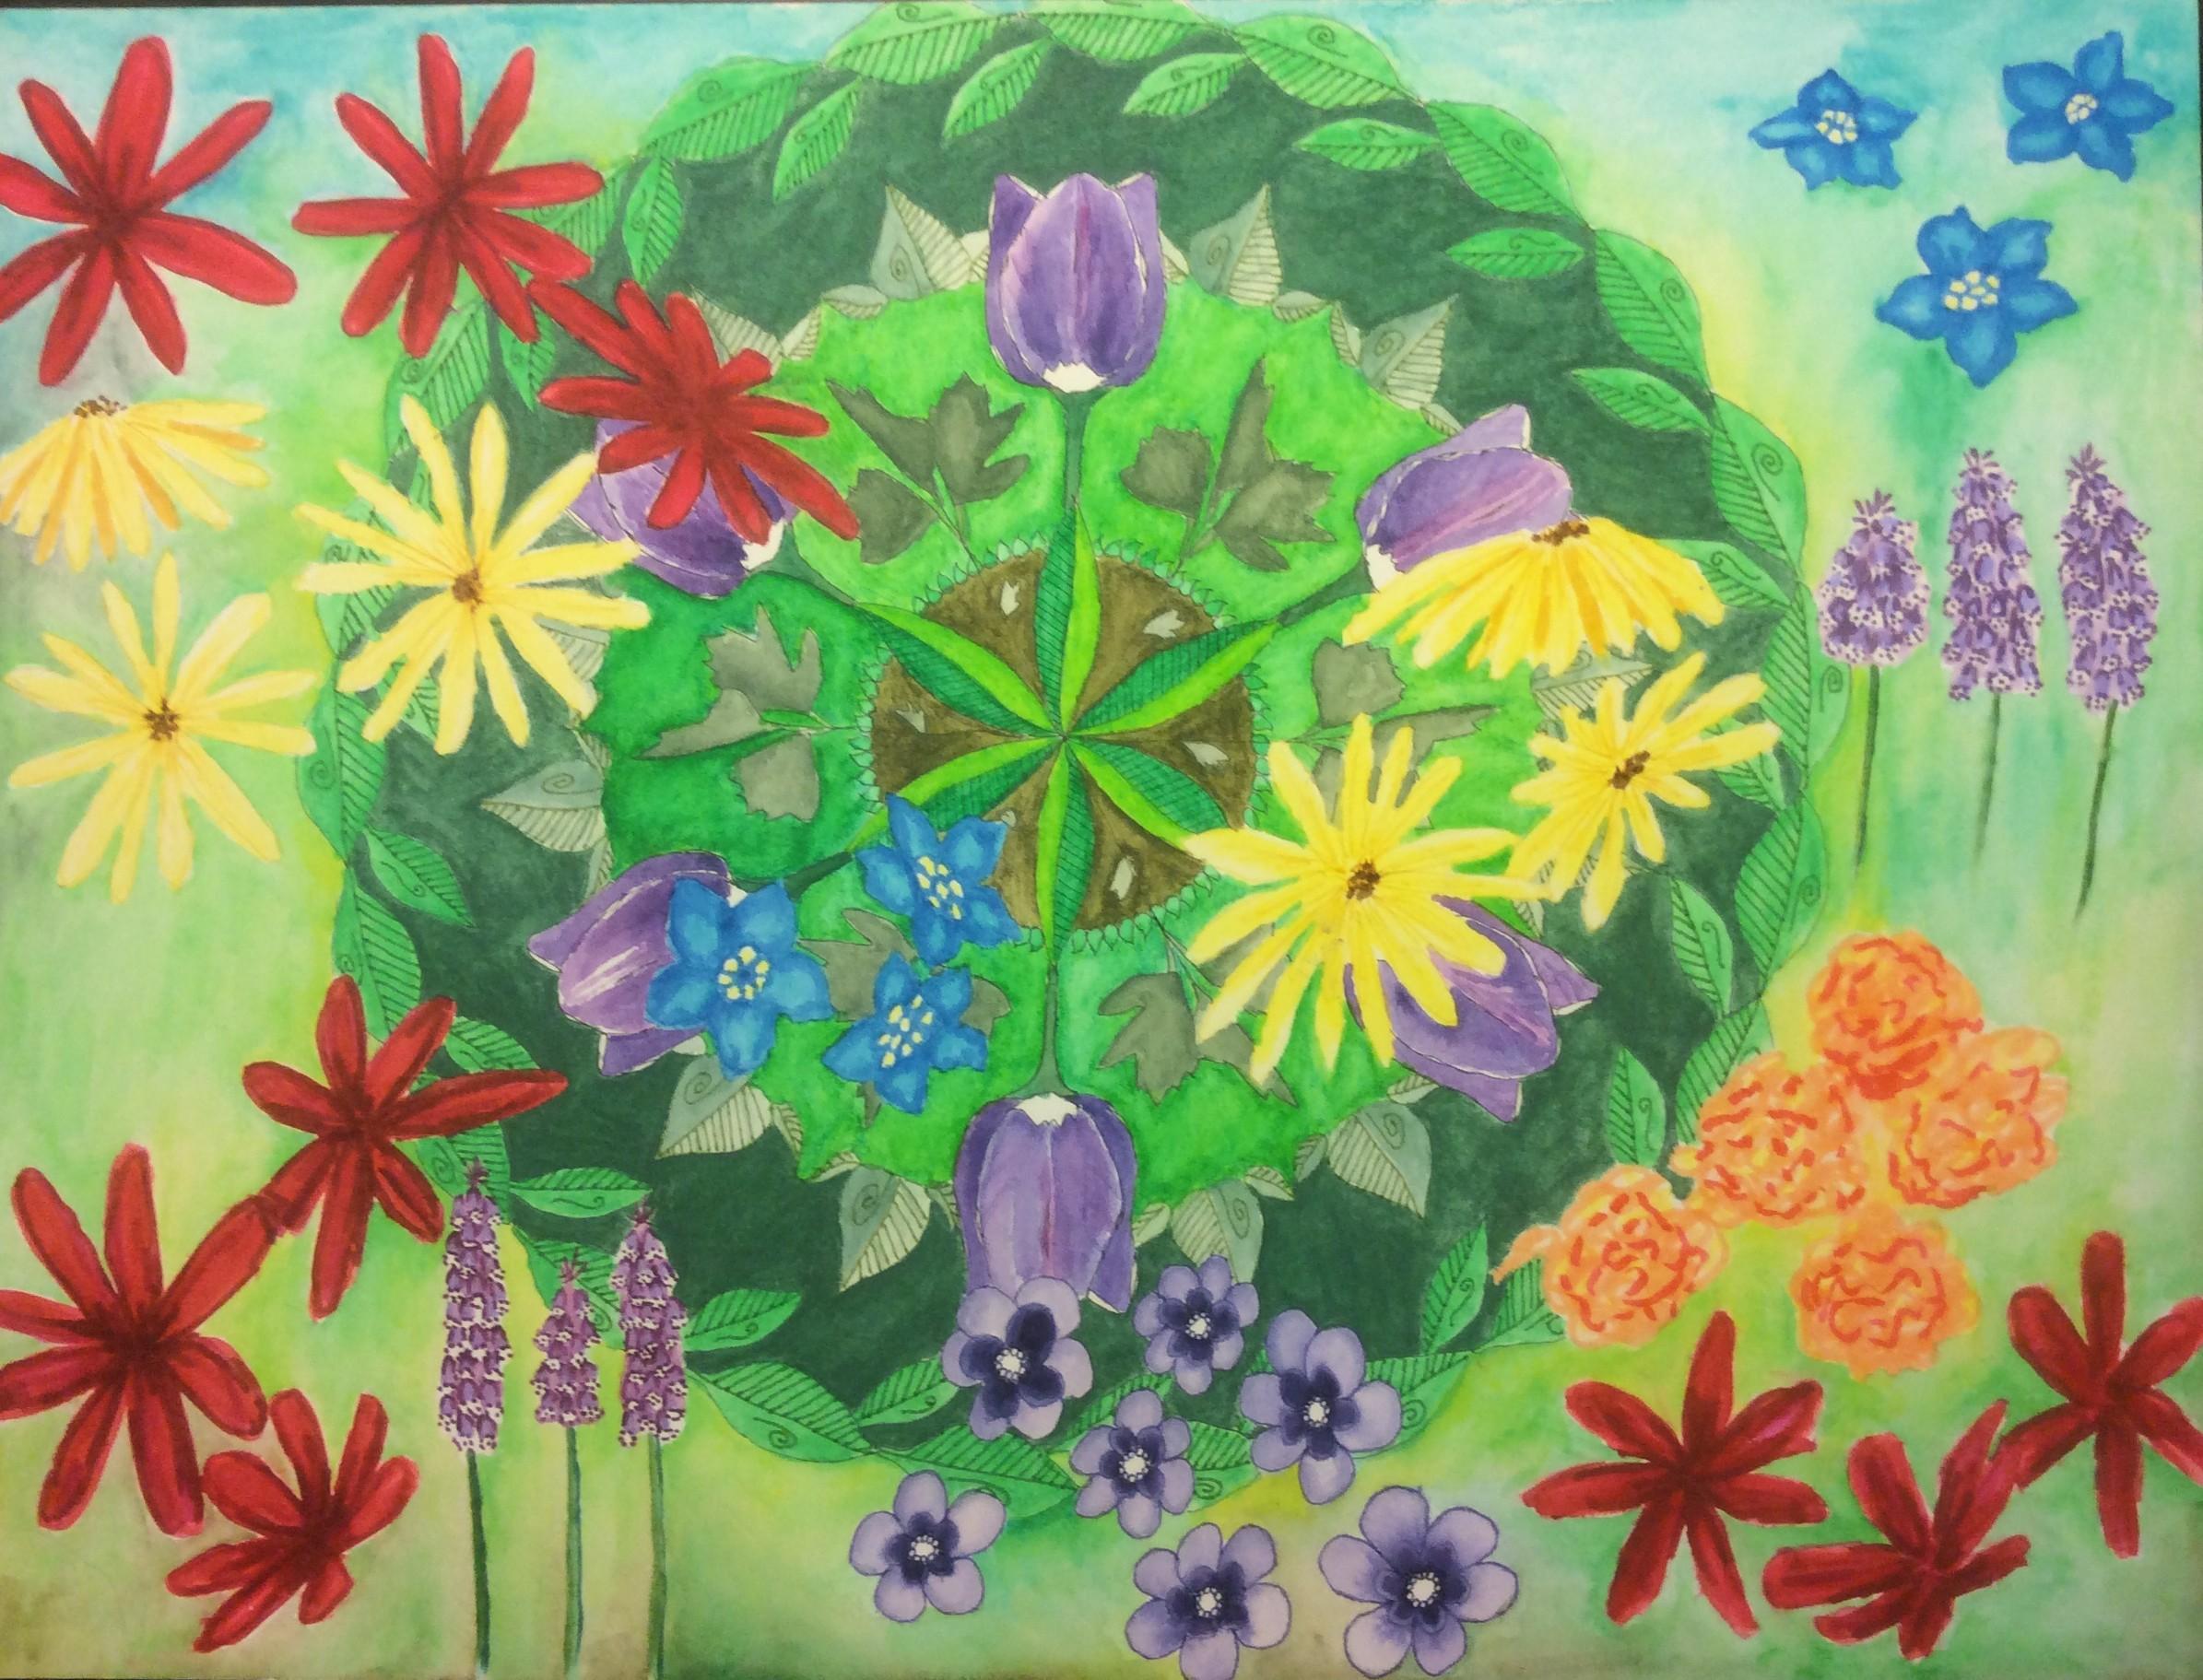 Leaf Mandala With Flowers